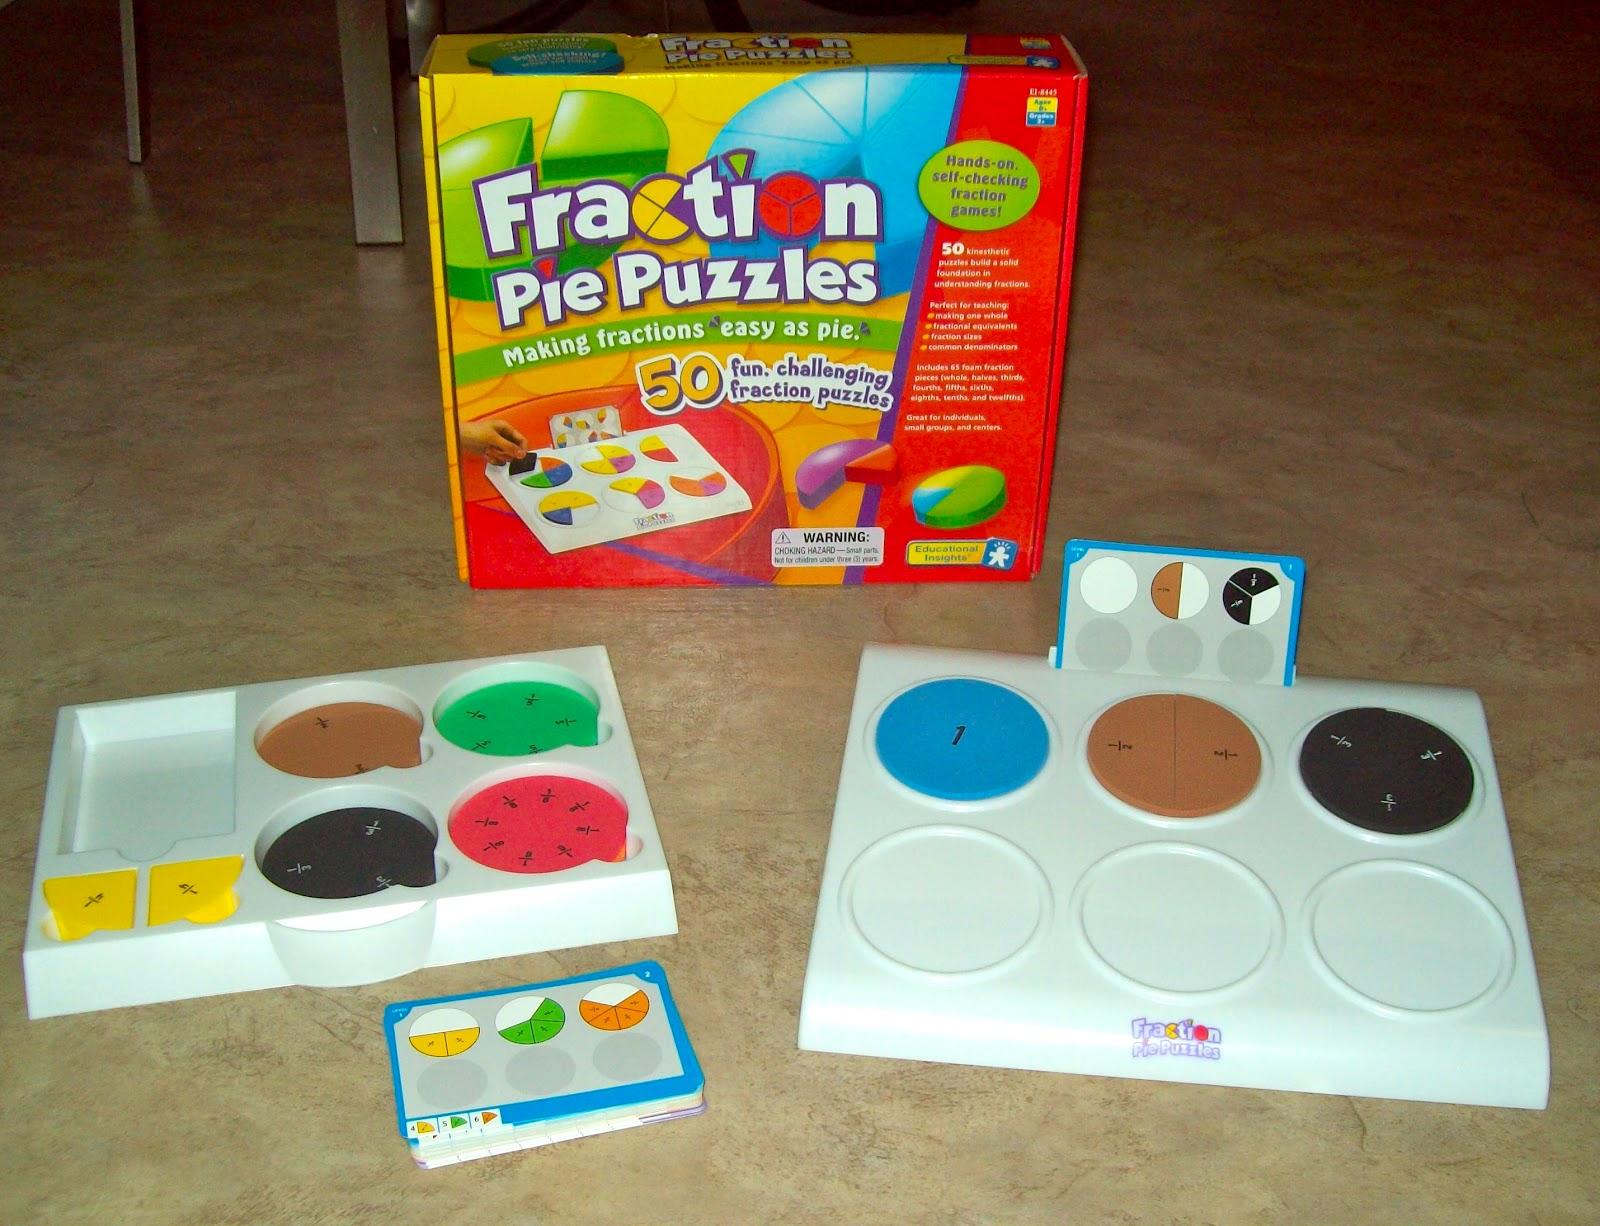 Fraction Pie Puzzles Your Fraction Pie Puzzles